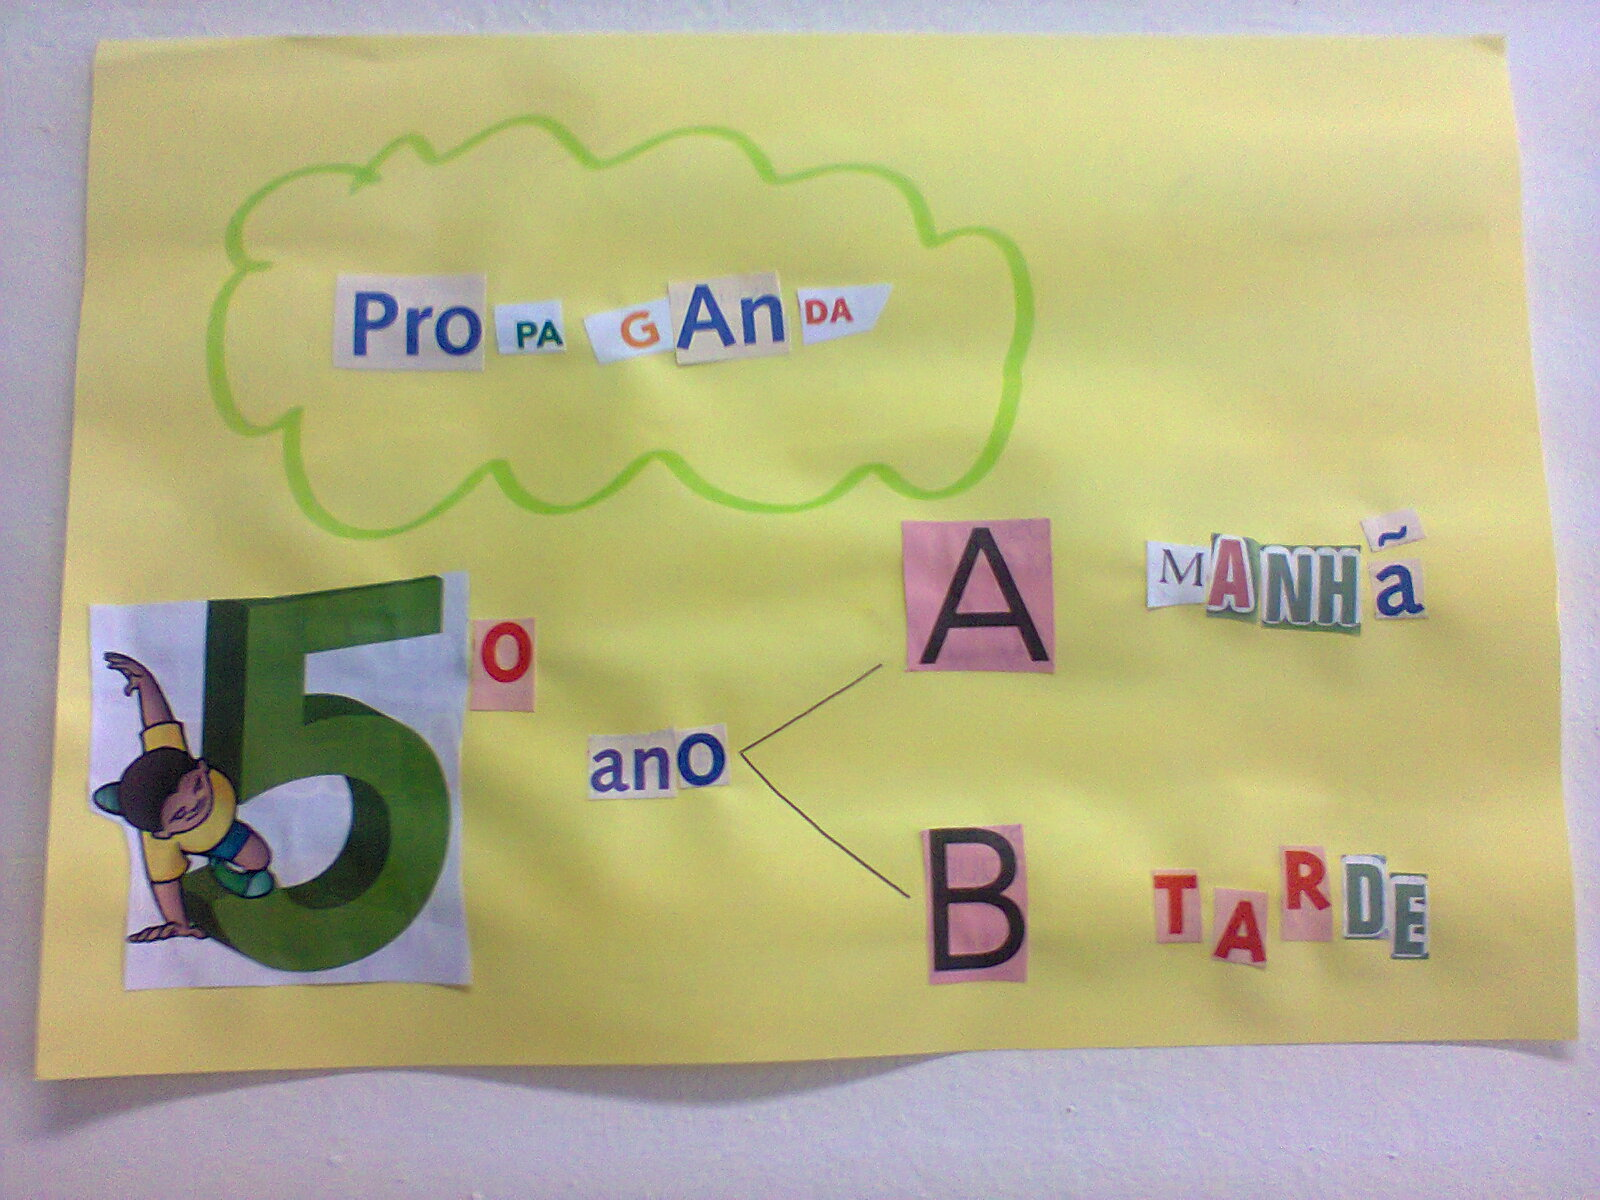 cartaz propaganda 5º ano A e B.